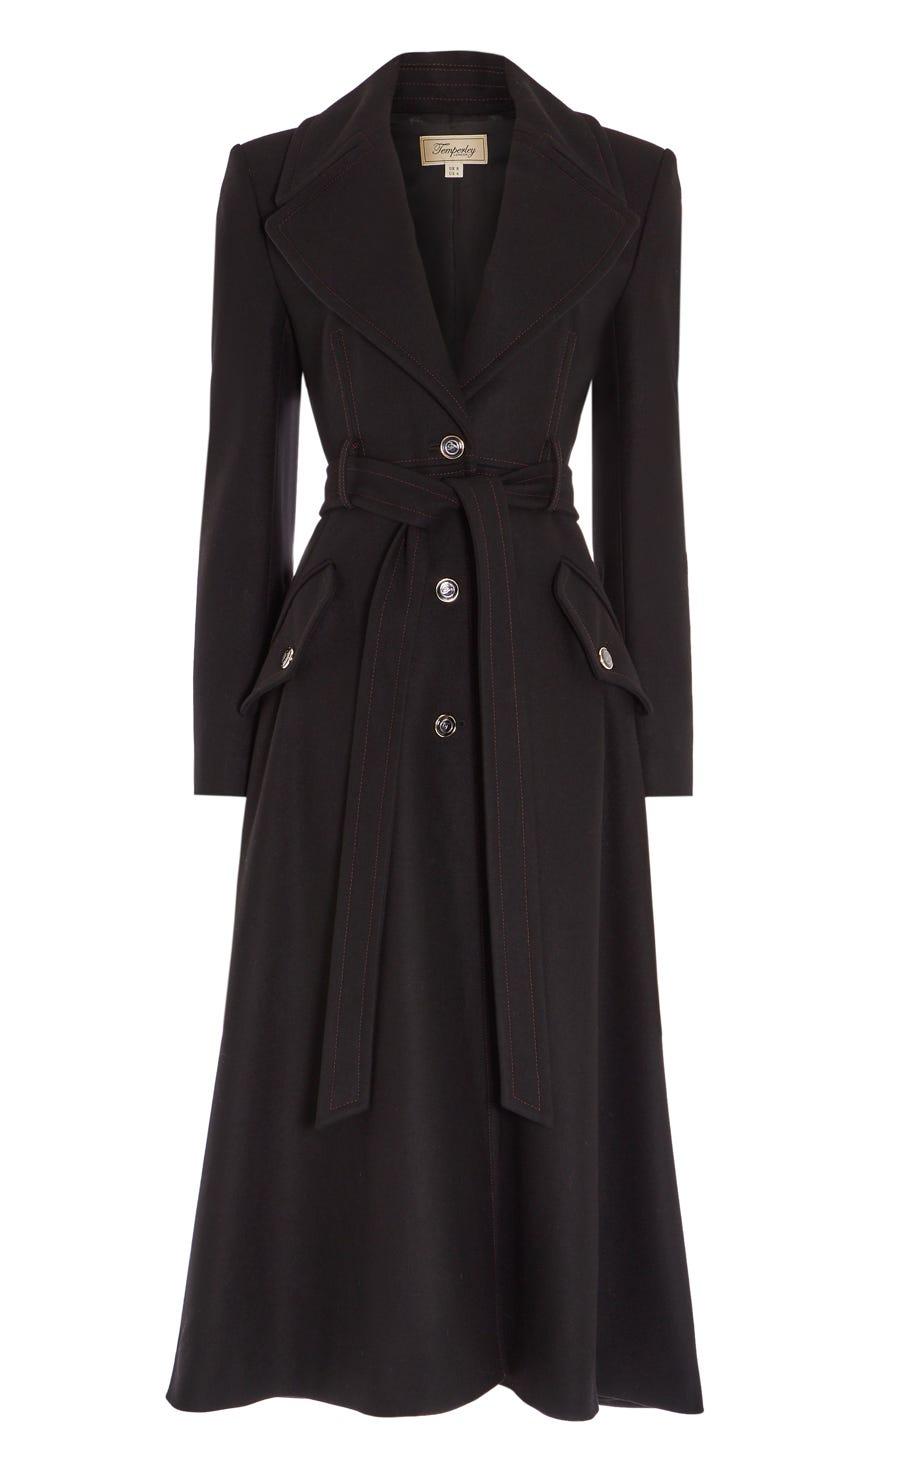 Jean Tailored Coat